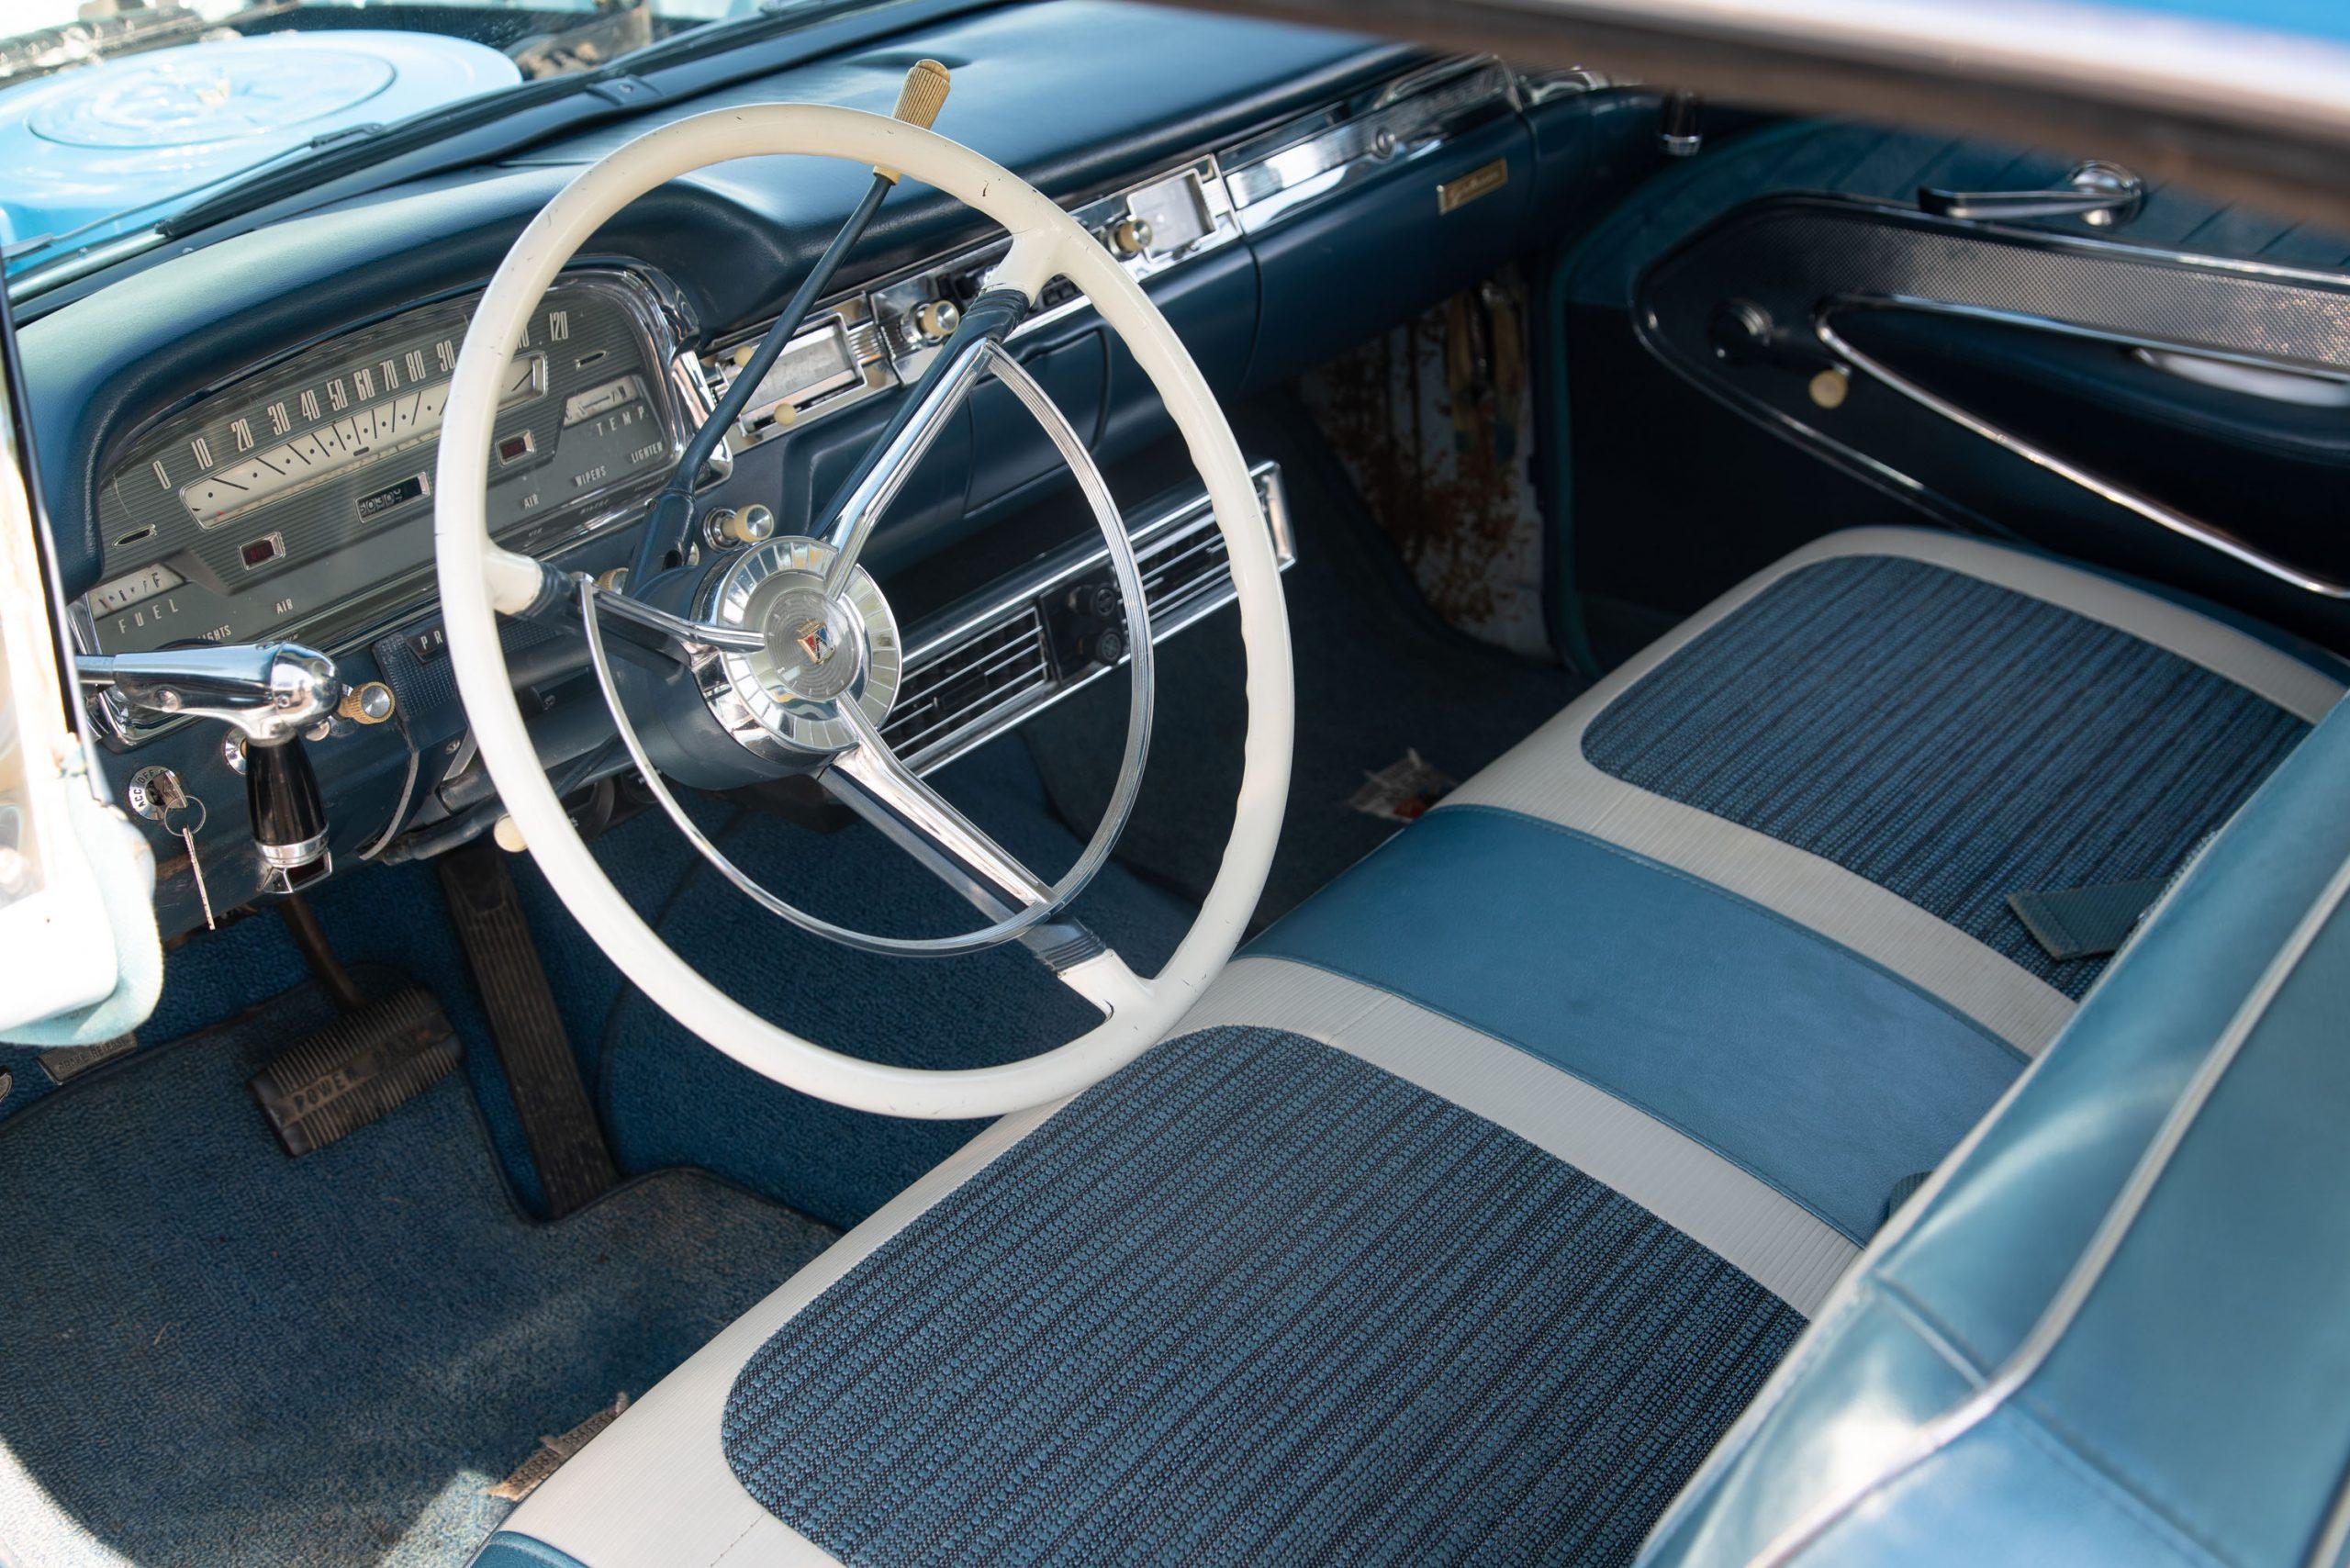 1959-Ford-Fairlane-500-Galaxie-Skyliner-interior